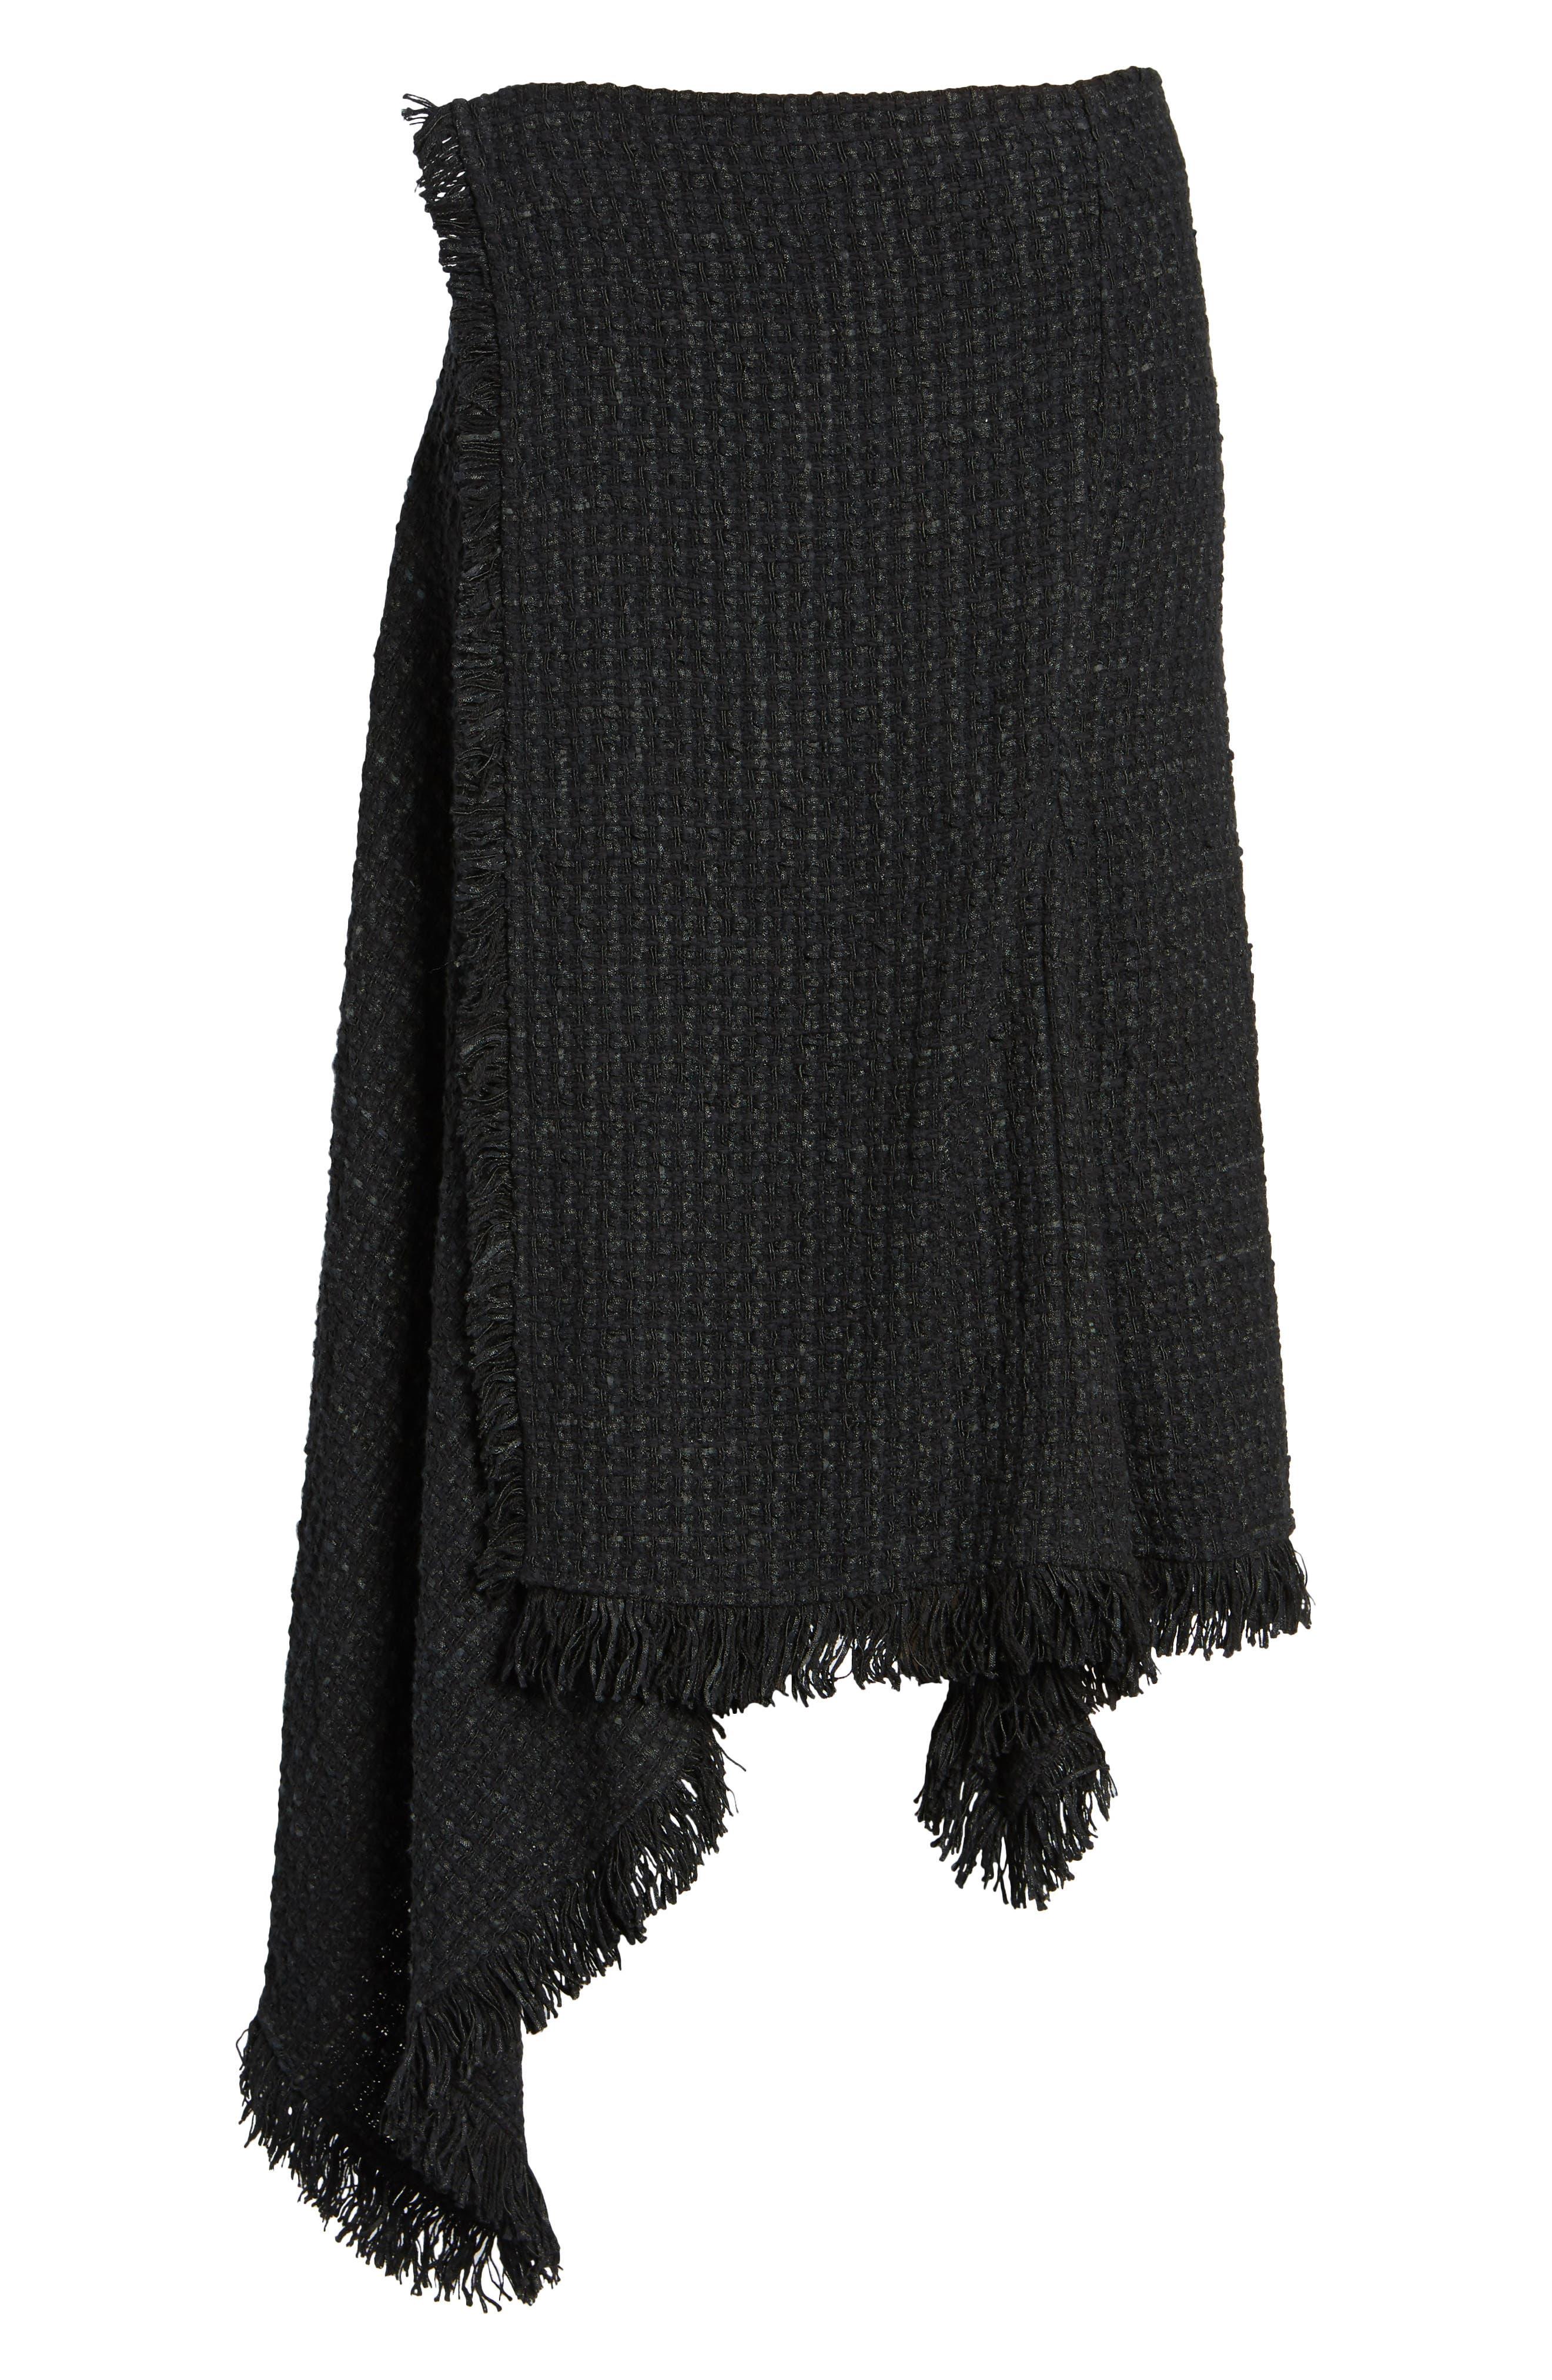 NIC + ZOE Majestic Tweed Skirt,                             Alternate thumbnail 6, color,                             004